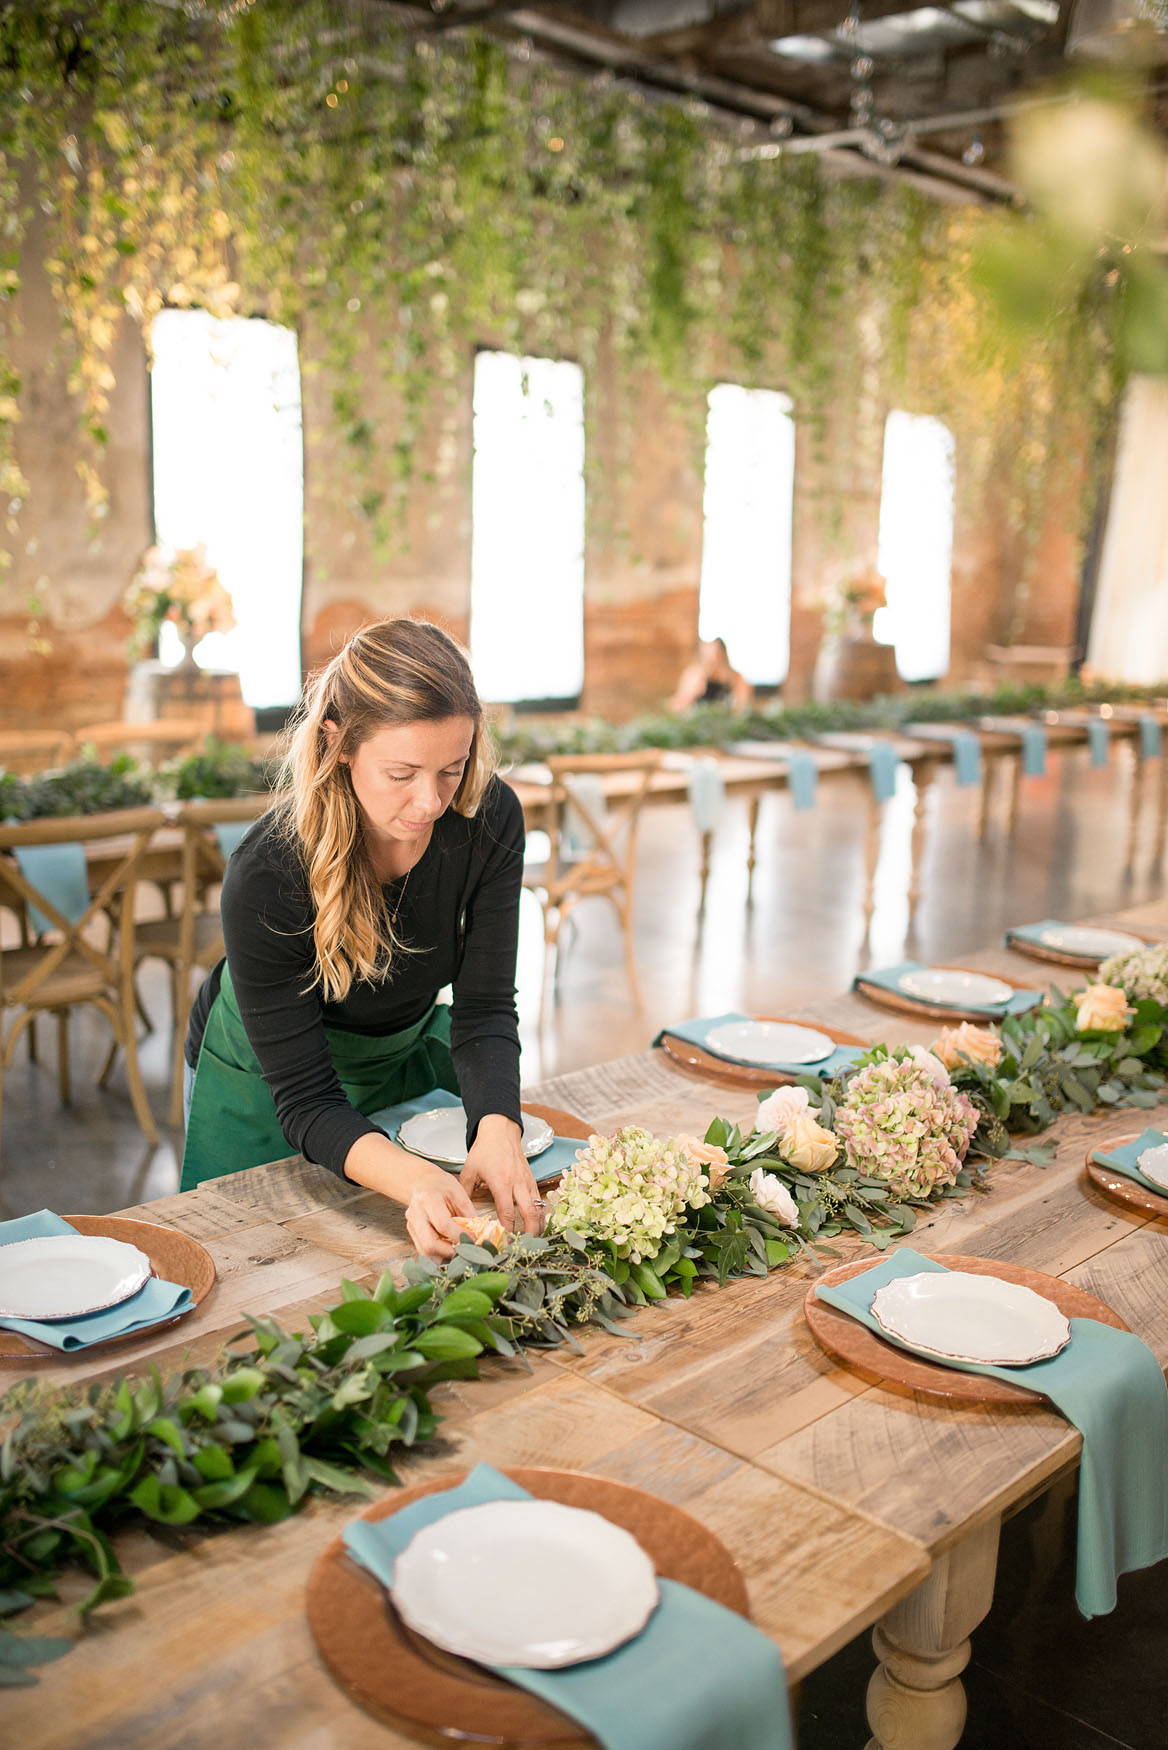 Diana Venditto arranging floral centerpiece